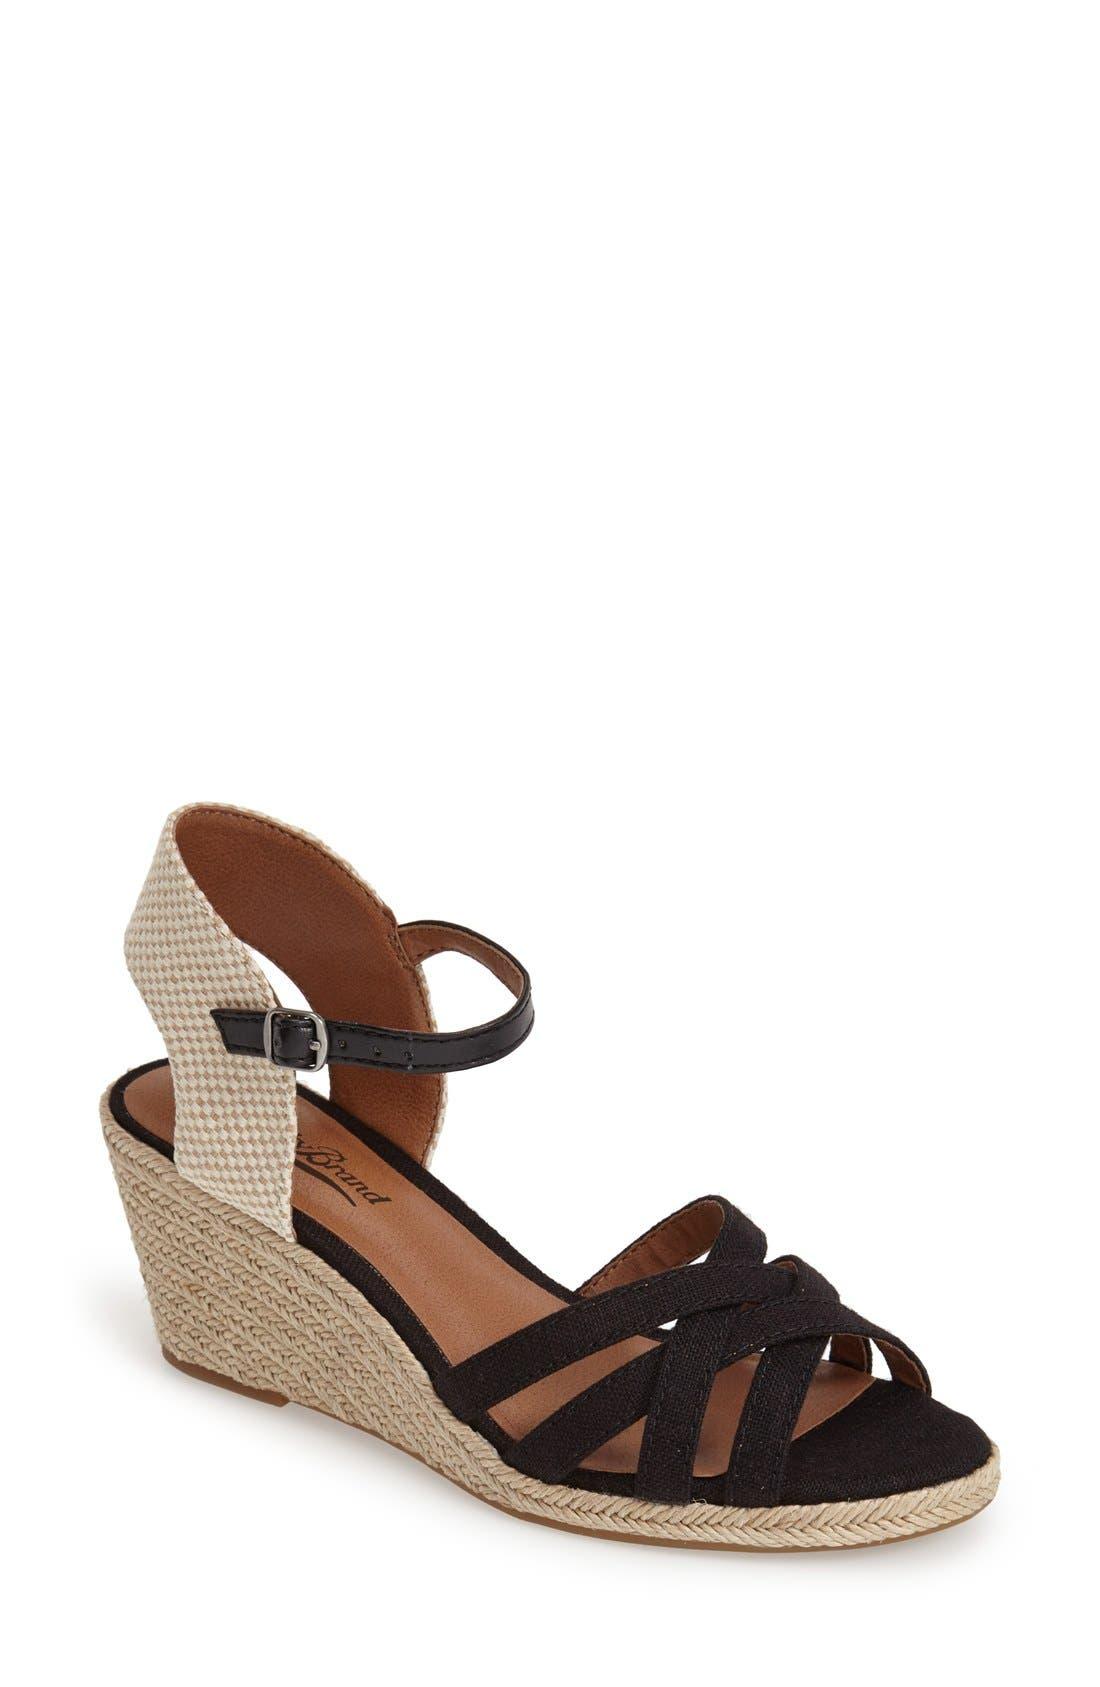 'Kalessie' Espadrille Wedge Sandal,                             Main thumbnail 1, color,                             001